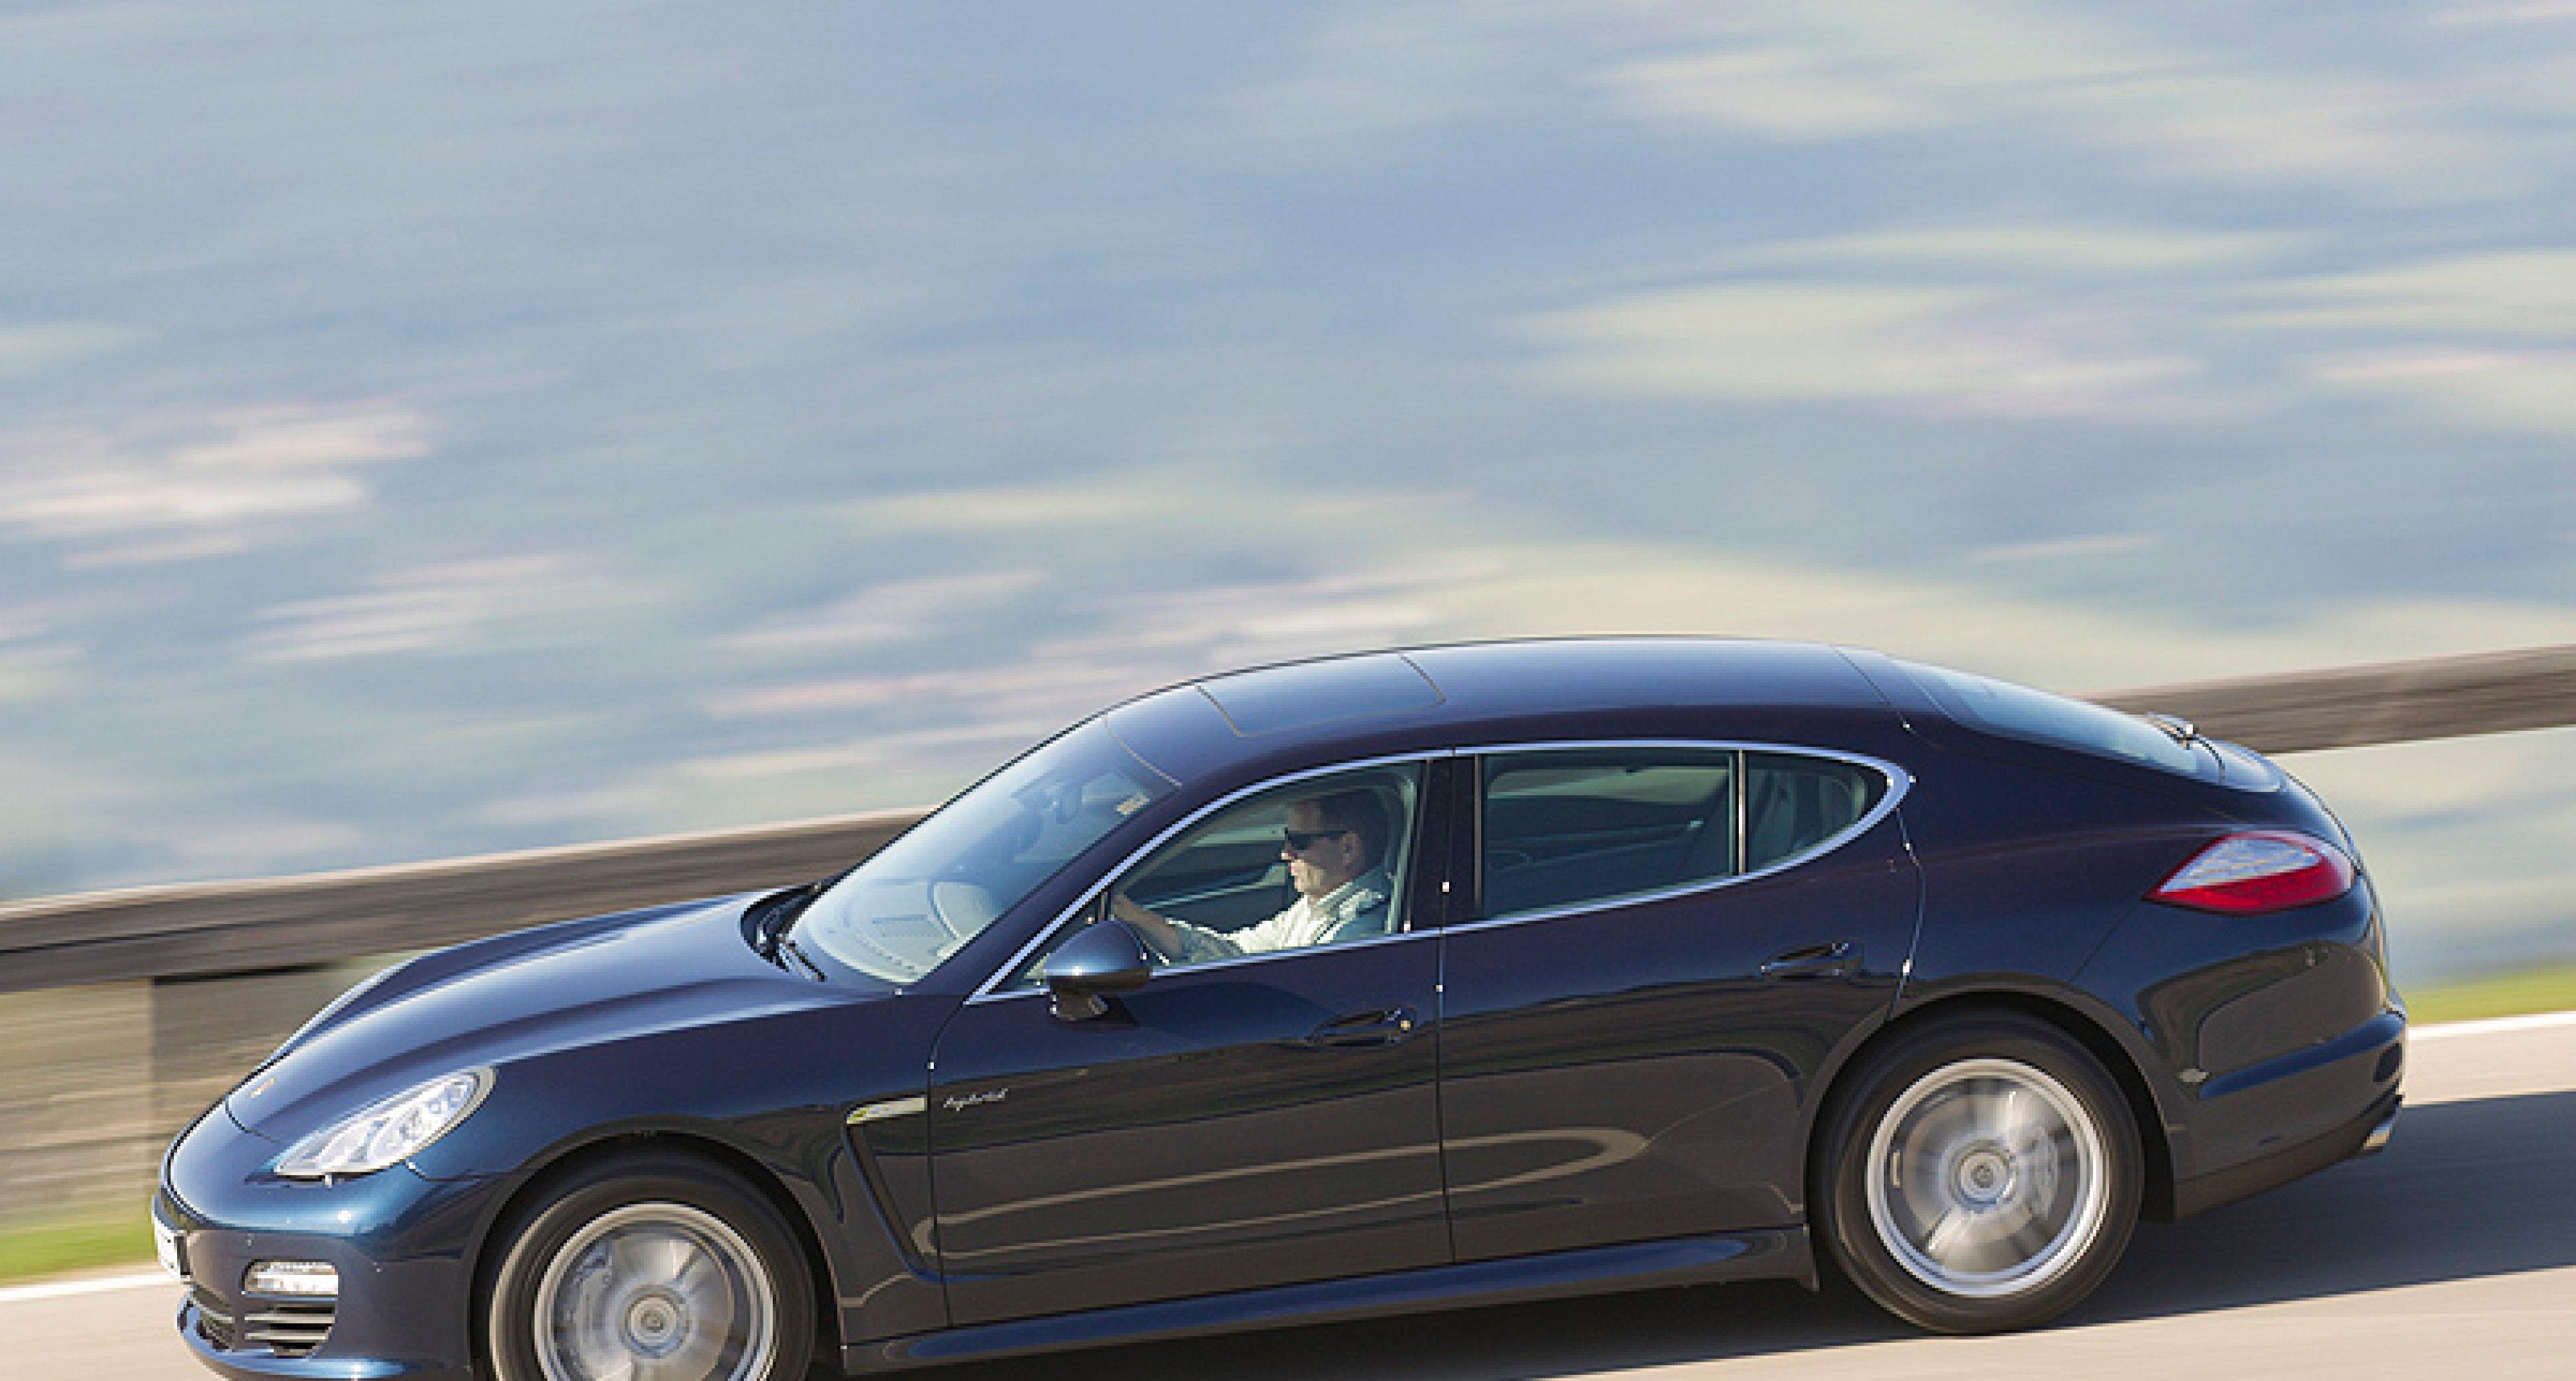 Porsche Panamera S Hybrid: Teuer sparen